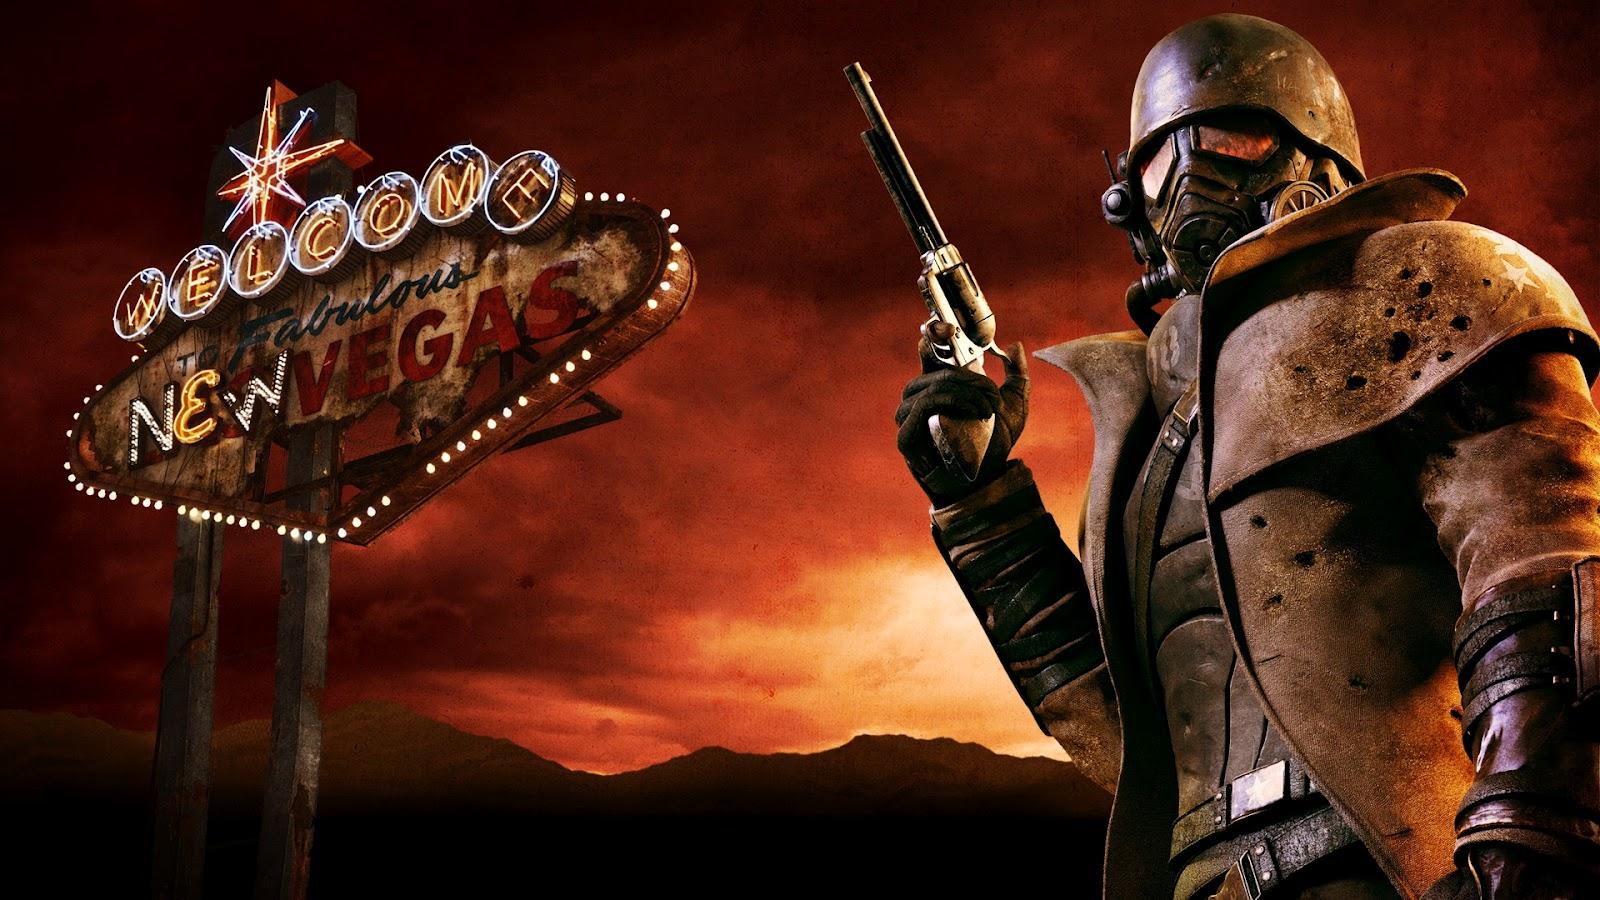 Hd Fallout New Vegas Wallpaper Wallpapersafari